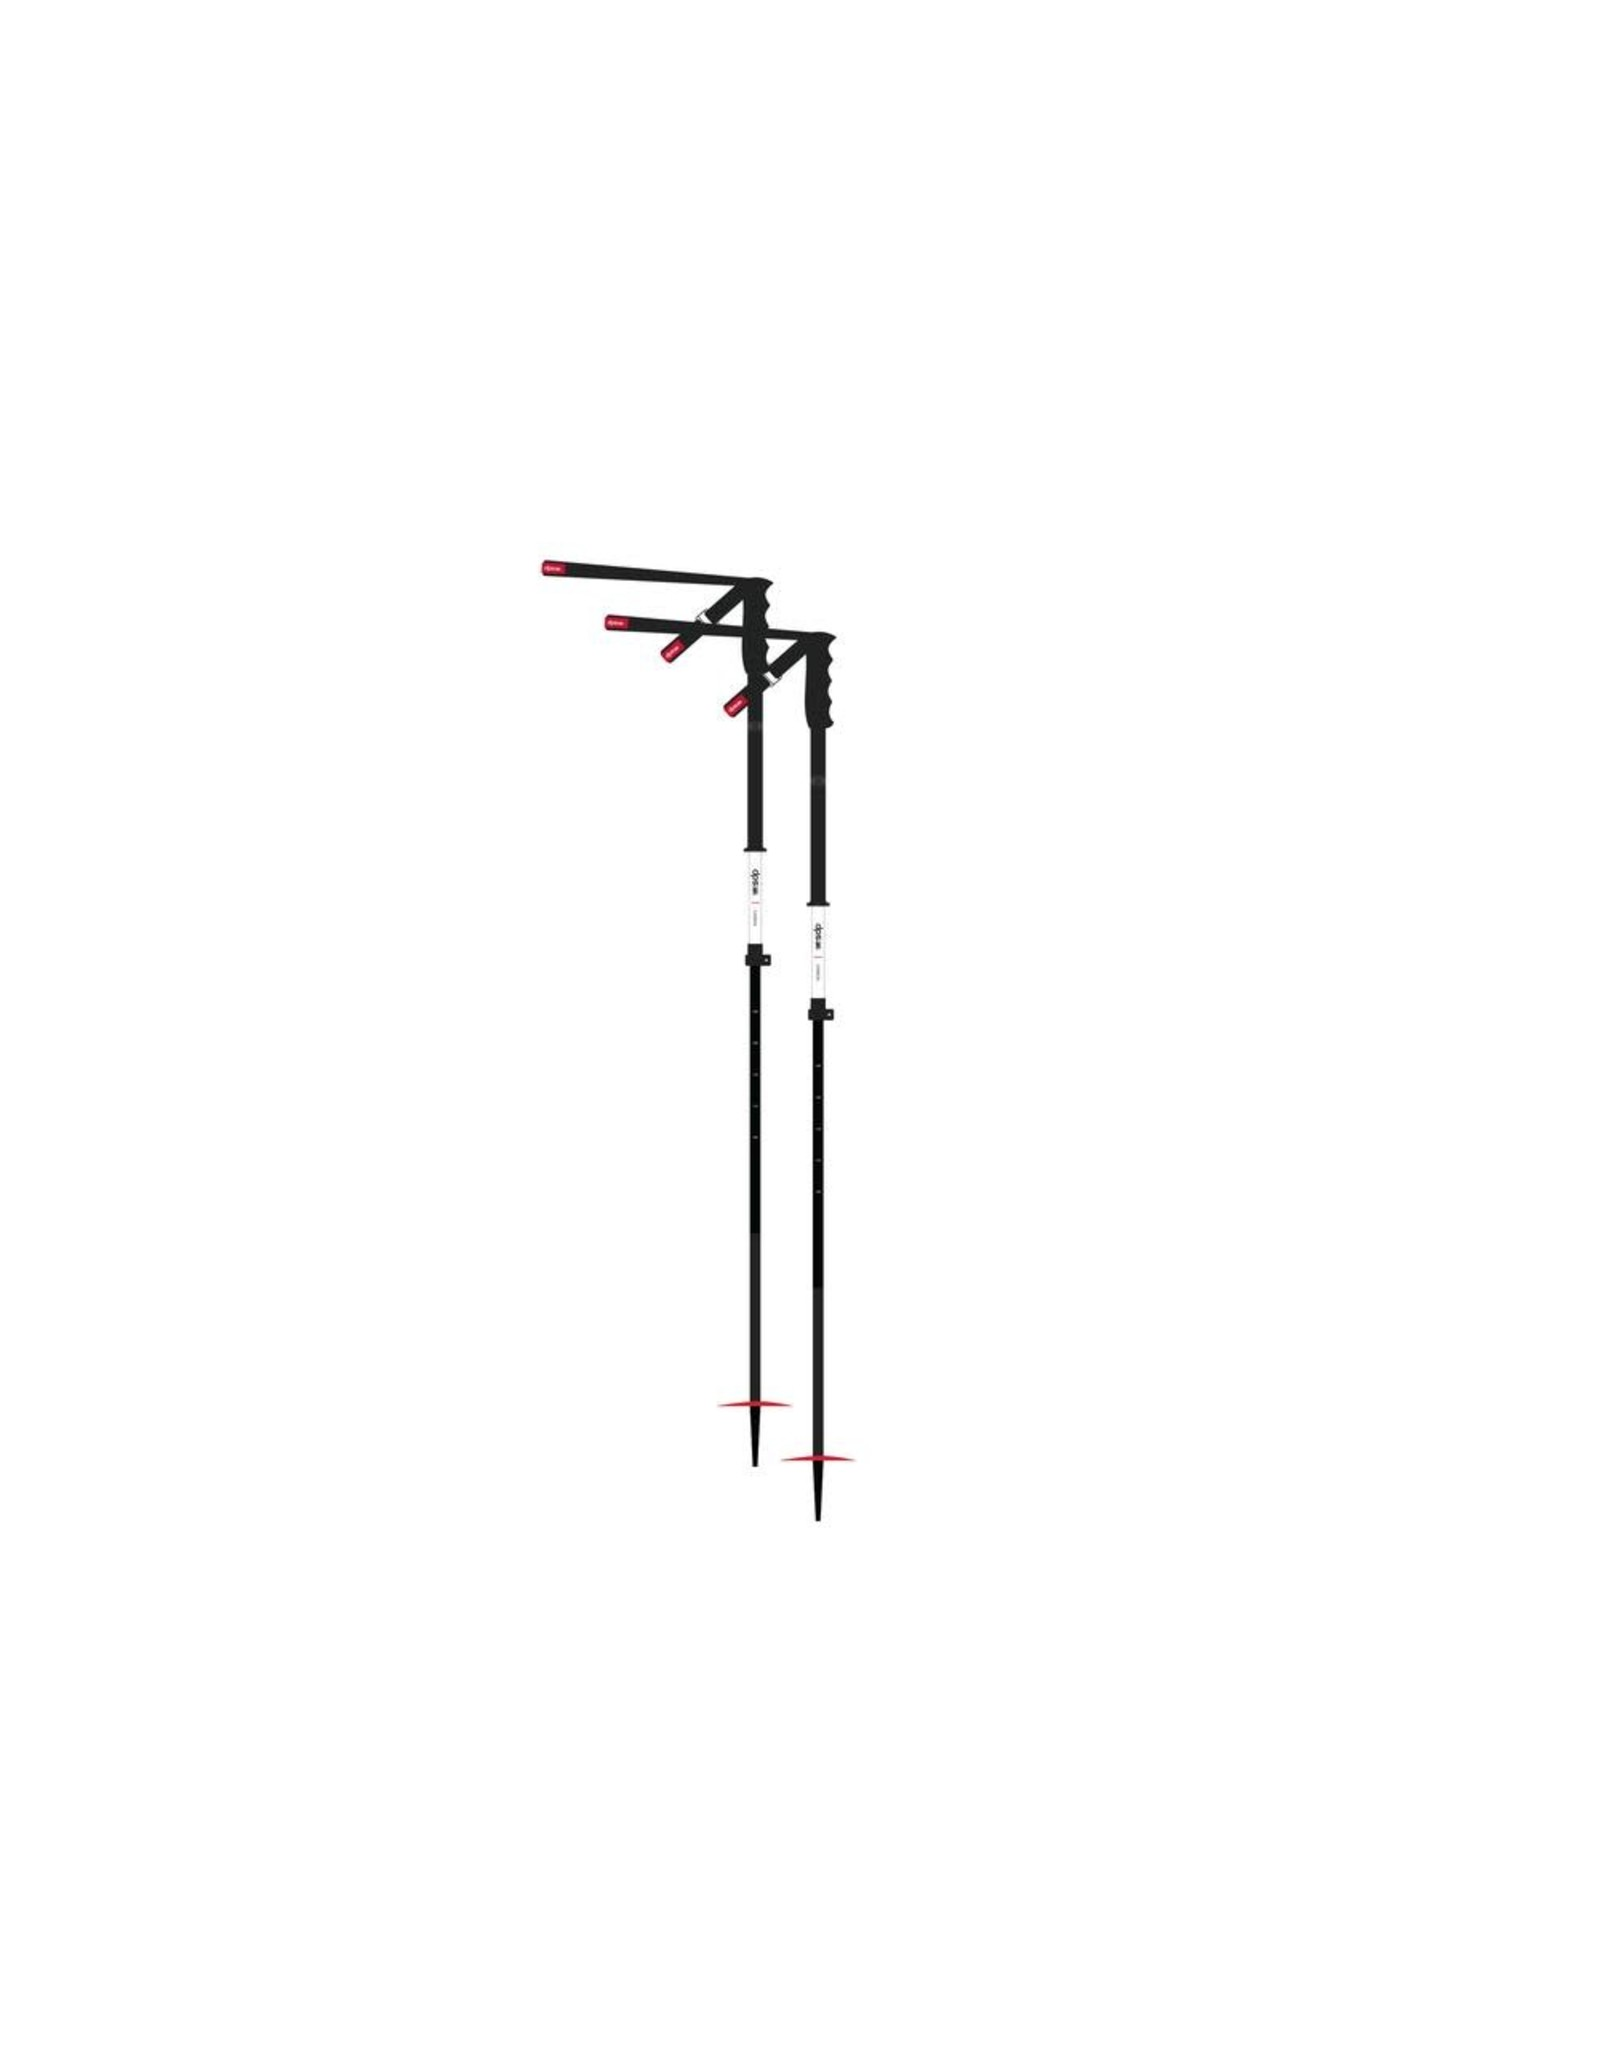 DPS DPS Extendable Pole